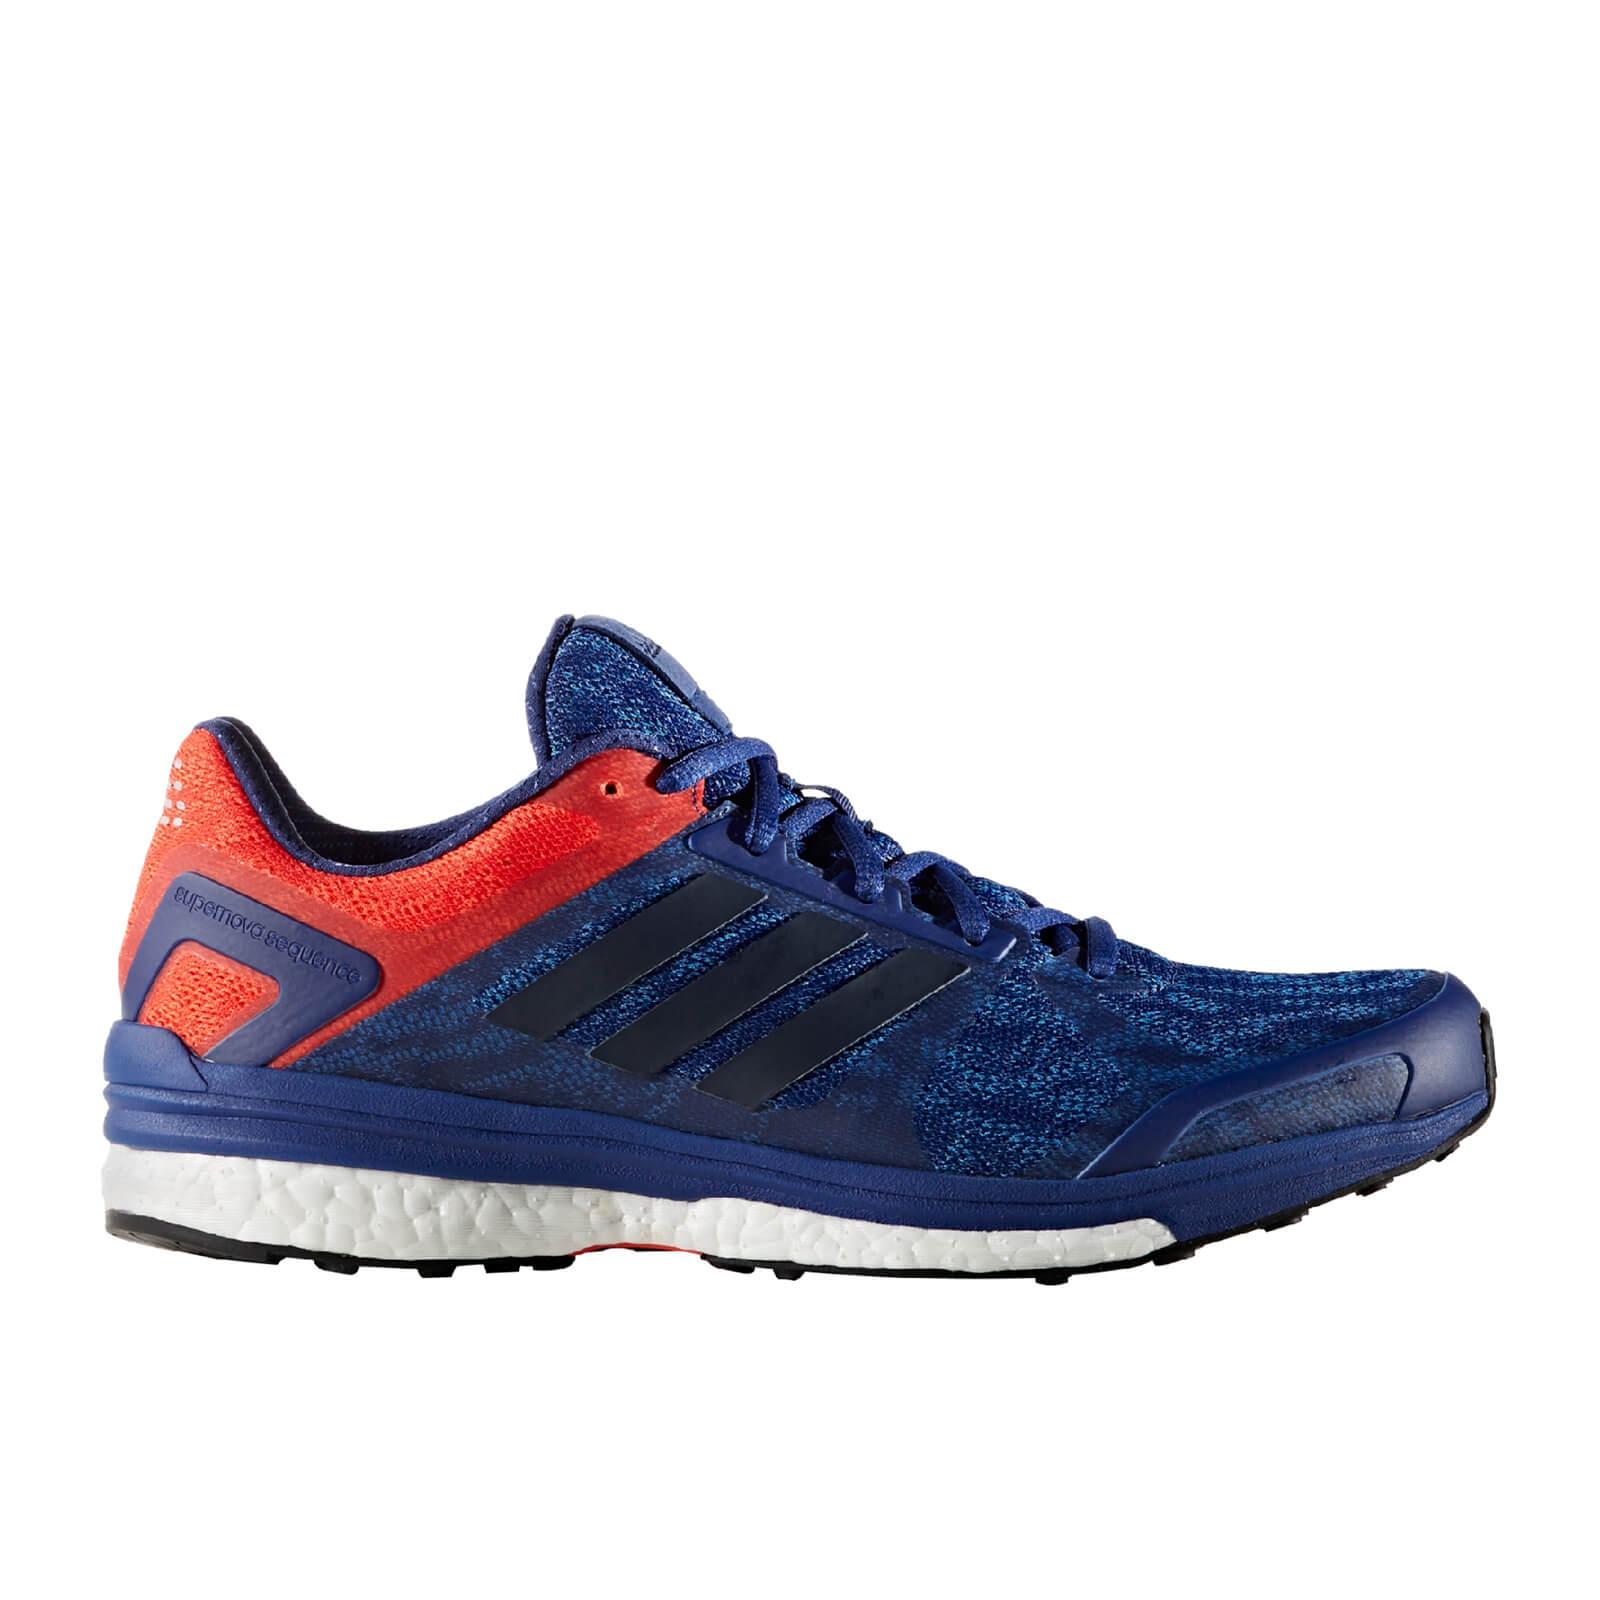 ecf8f96db021d adidas Men s Supernova Sequence 9 Running Shoes - Blue